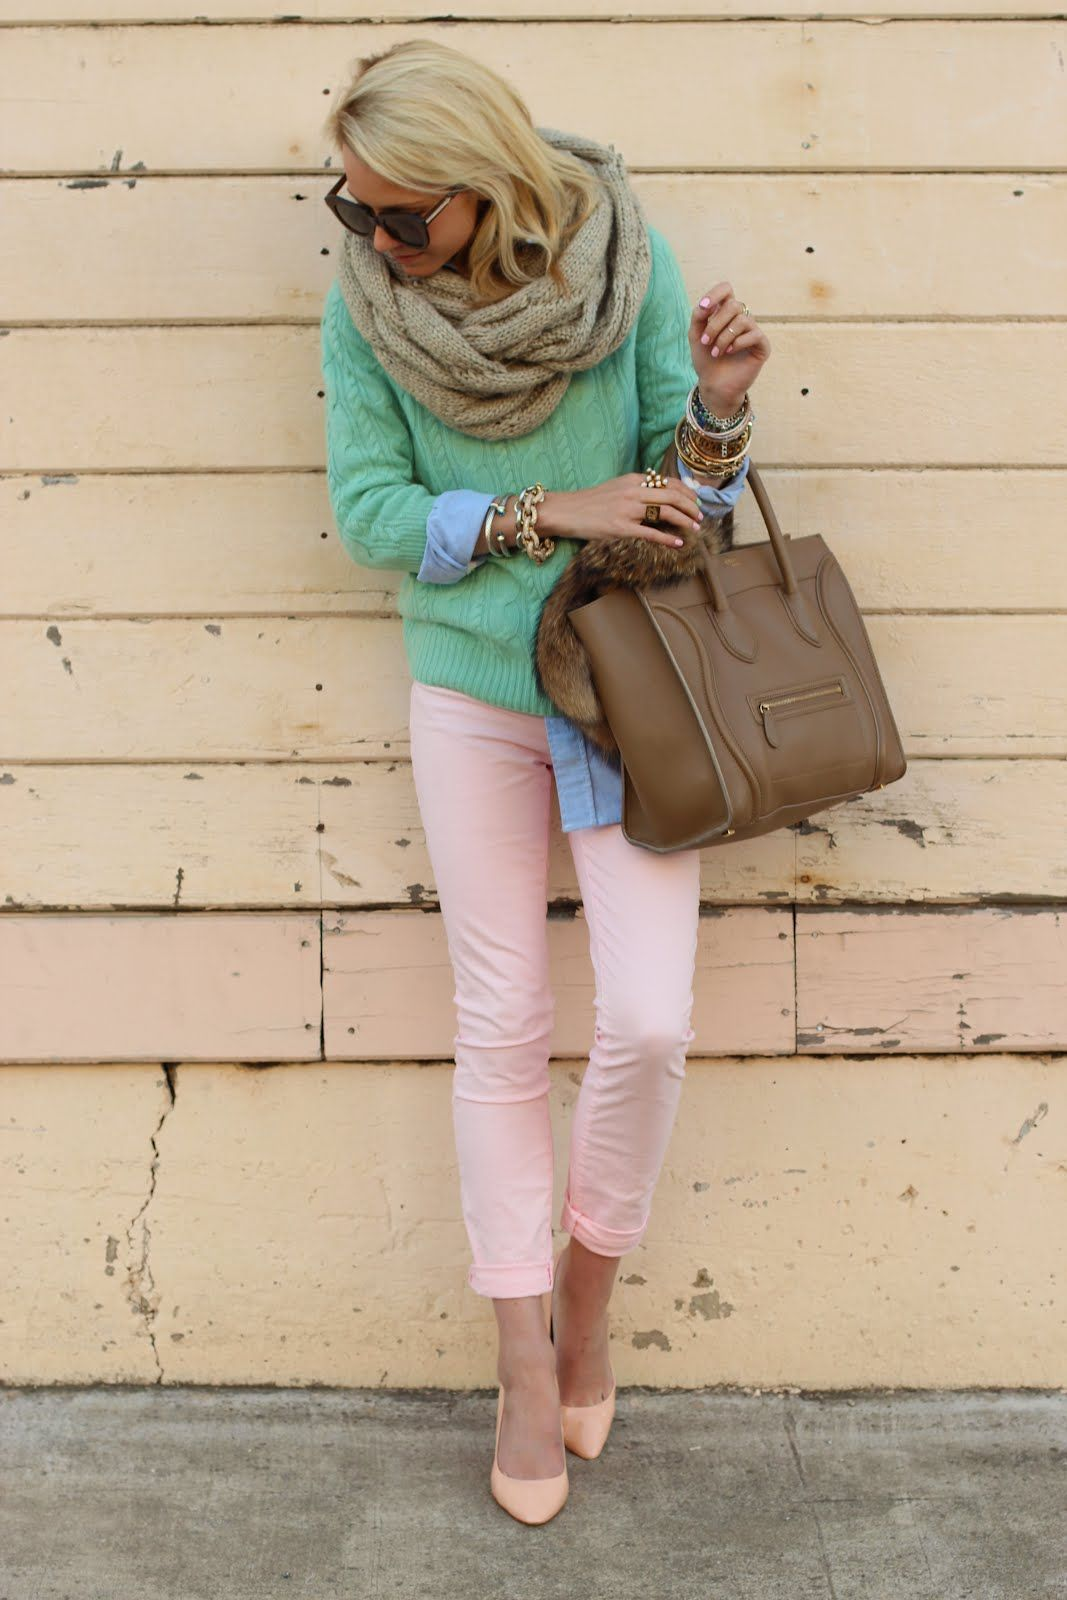 Love the Celine bag! ❤❤